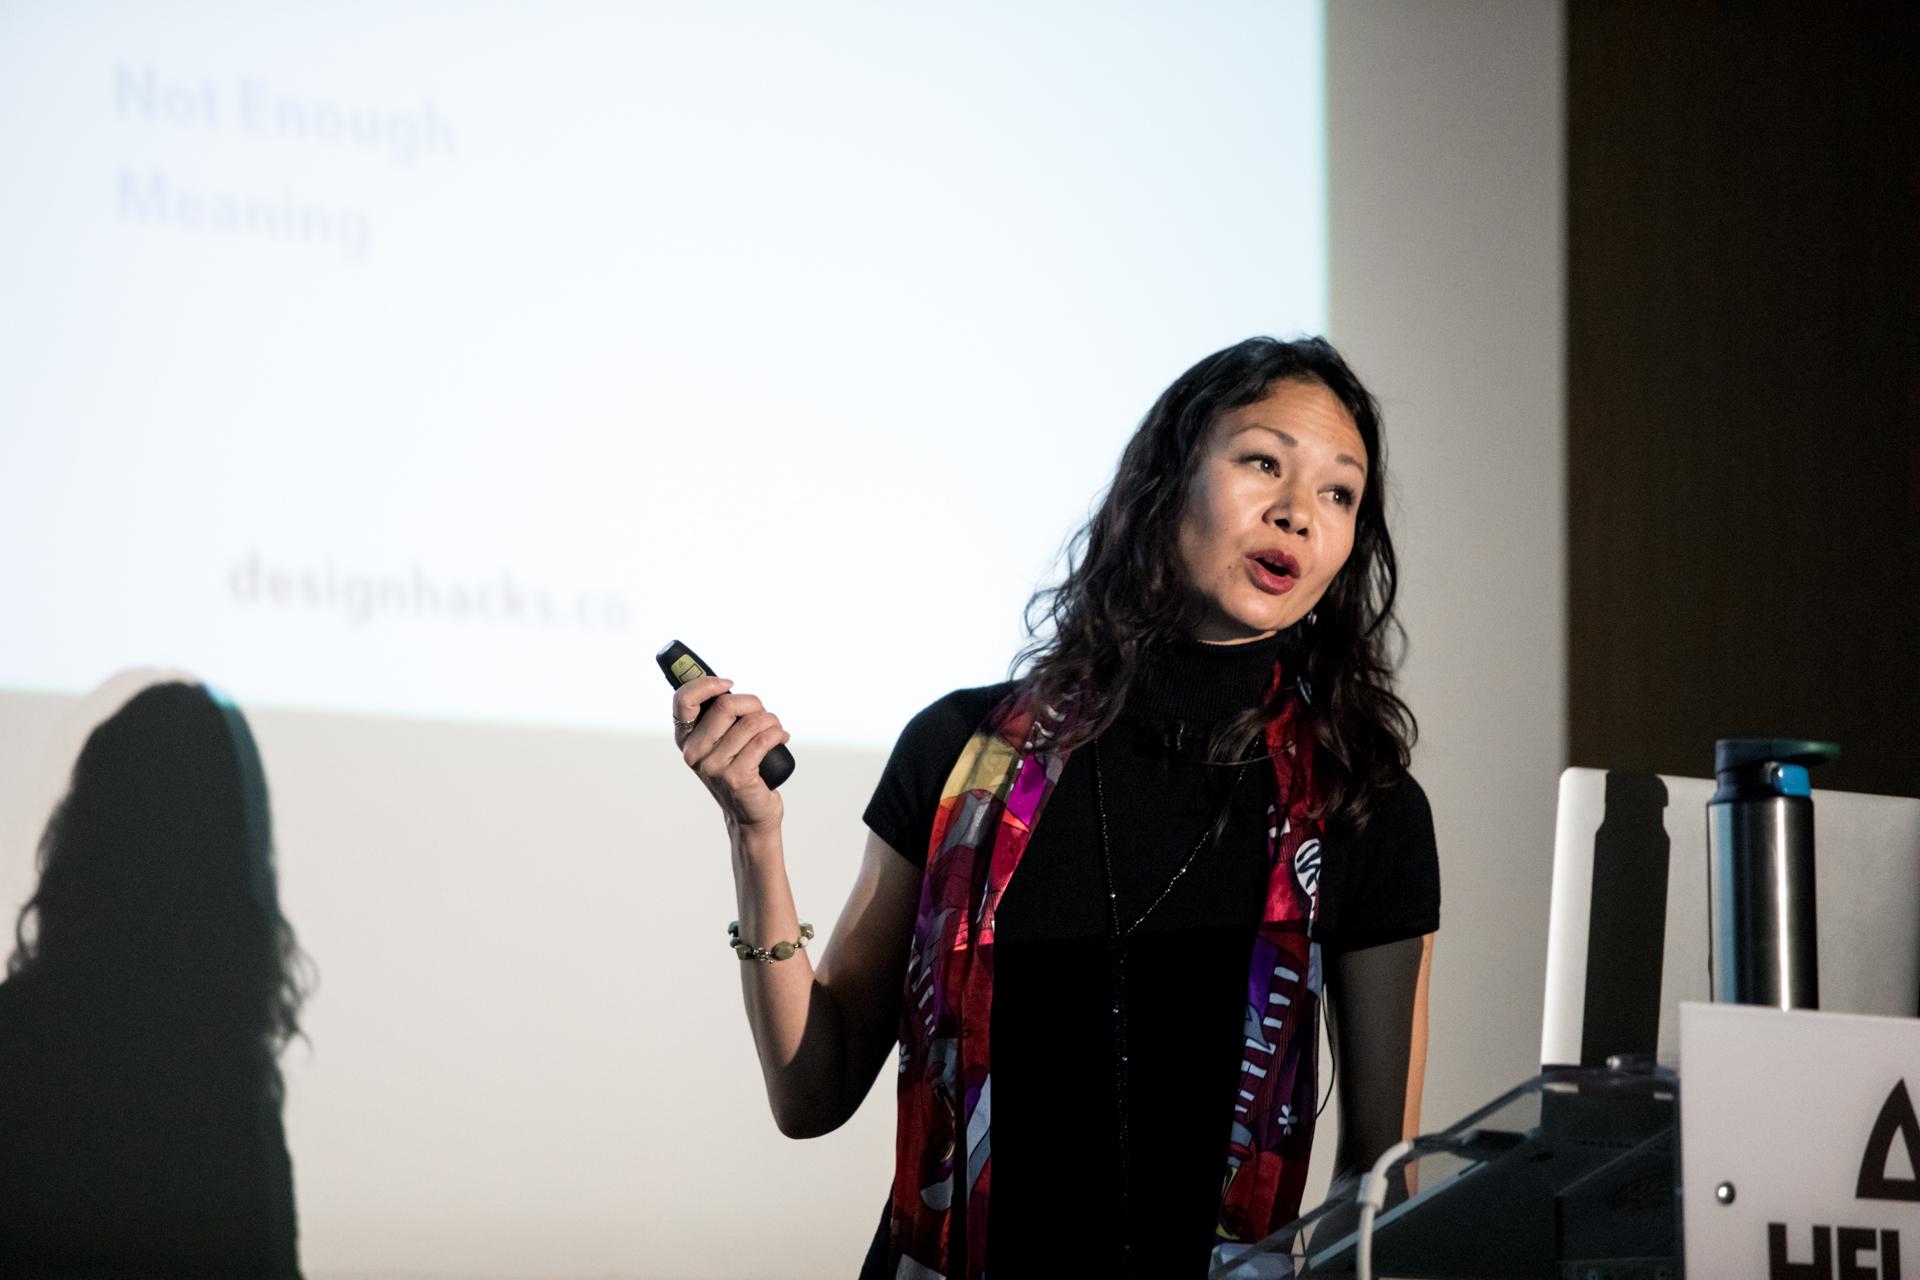 International Keynote Speaker Christina Aldan Nominated for 2019 Best Motivational Speaker/Coach